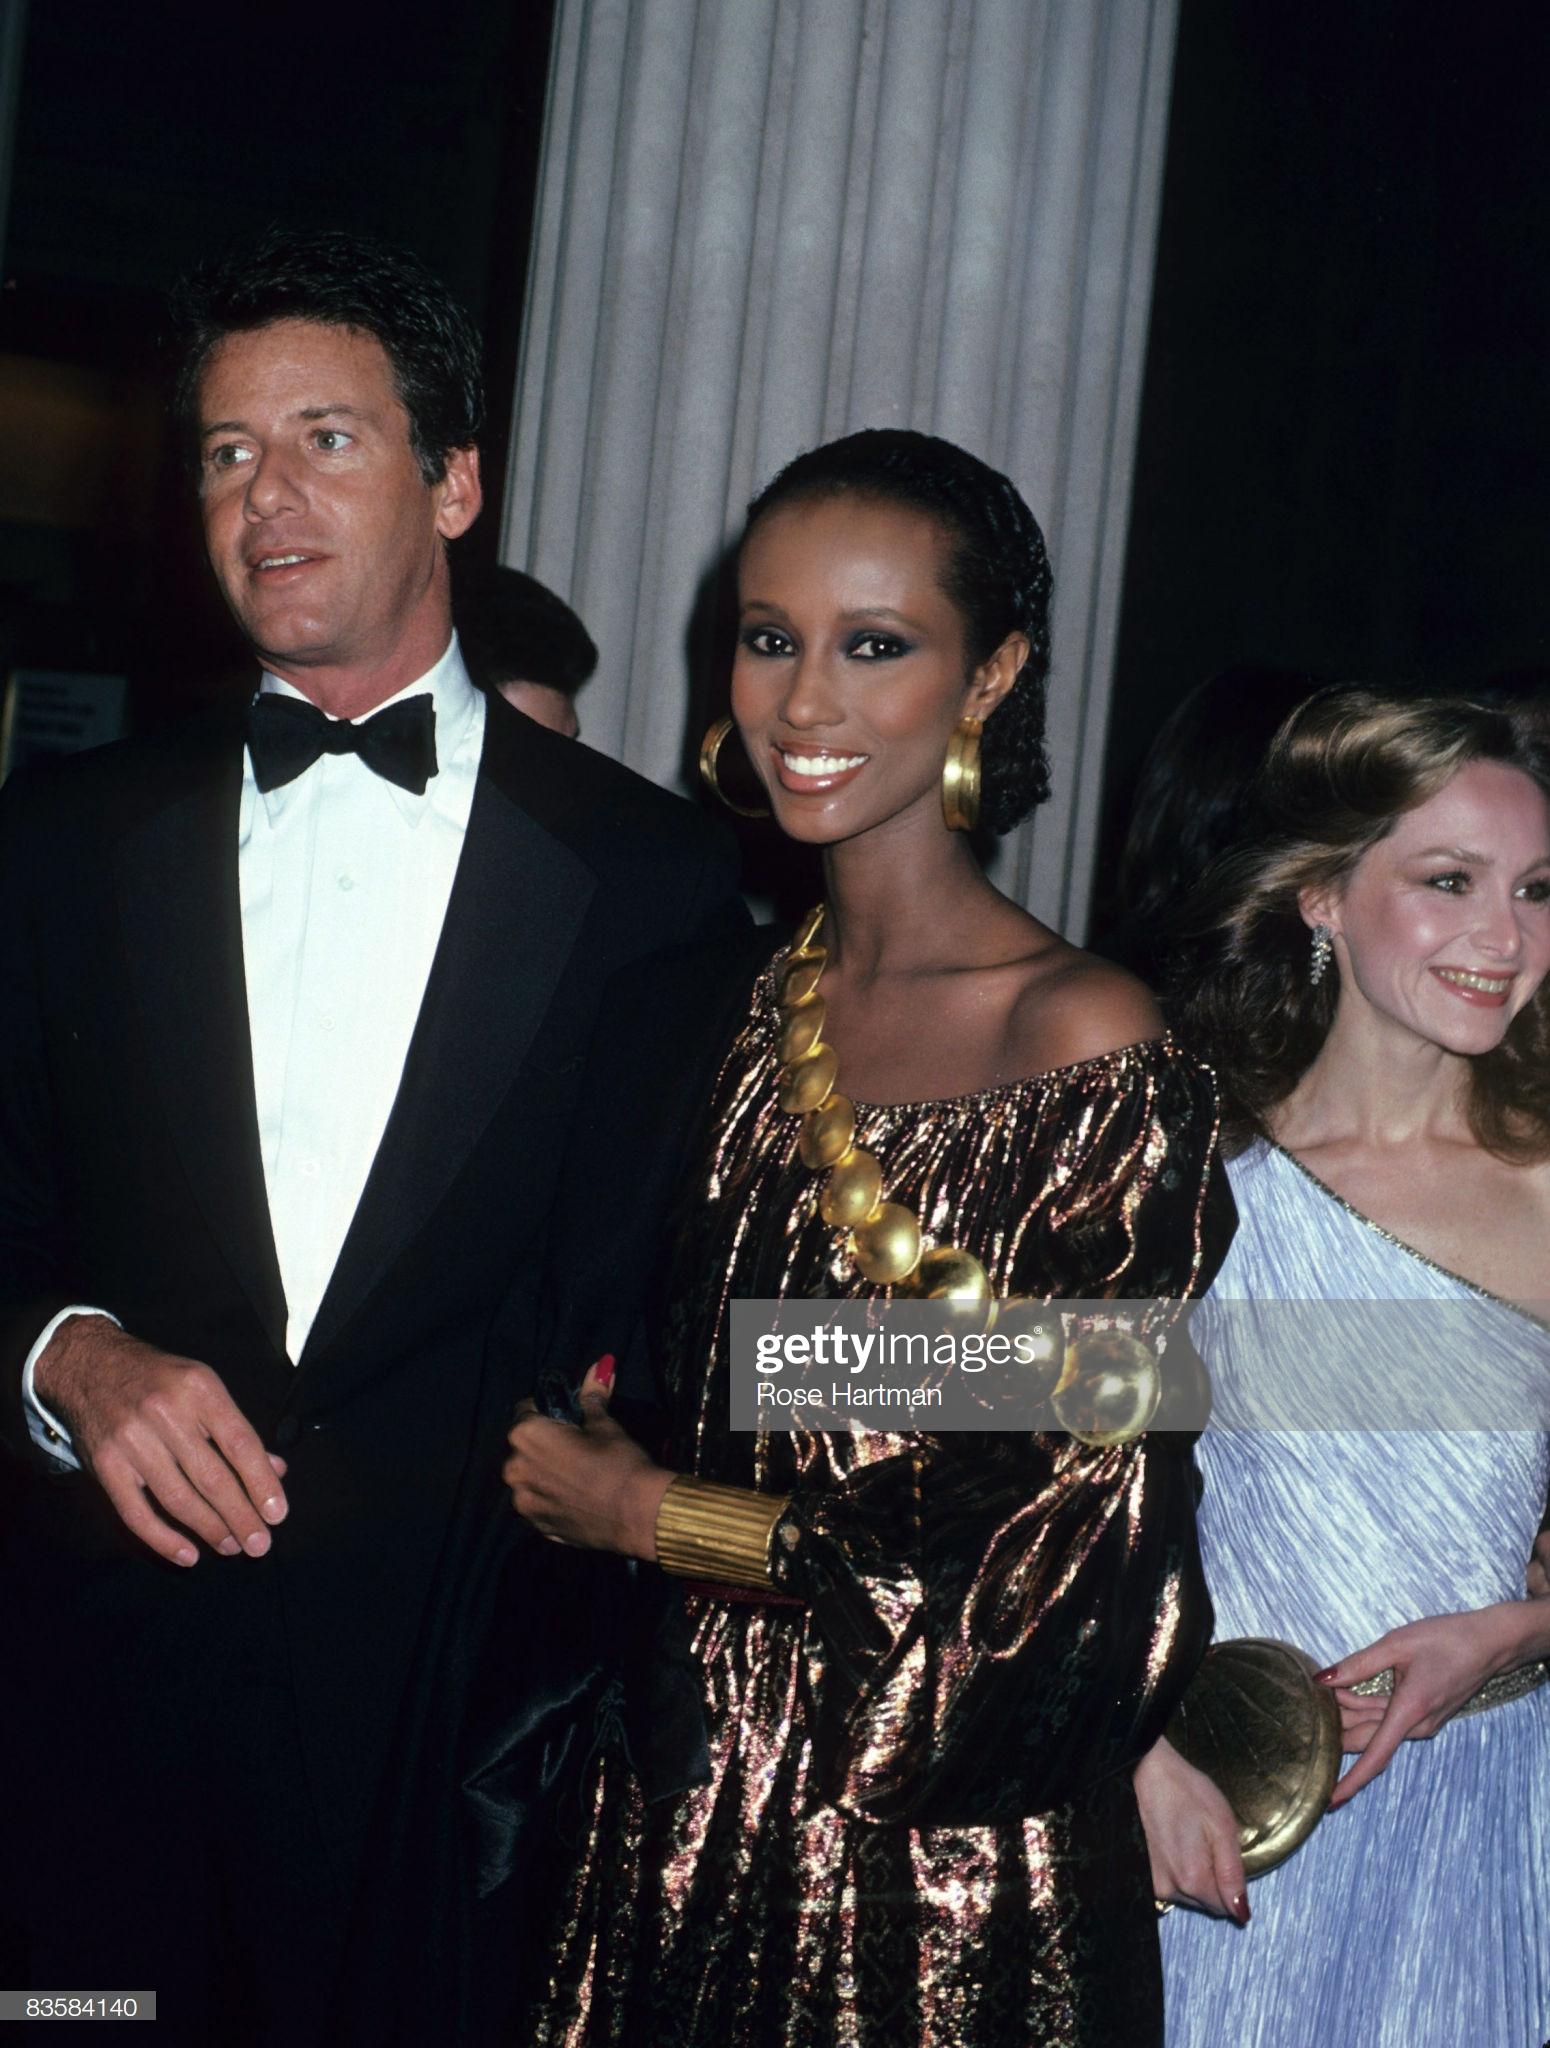 Metropolitan Museum Gala - 1981 : News Photo